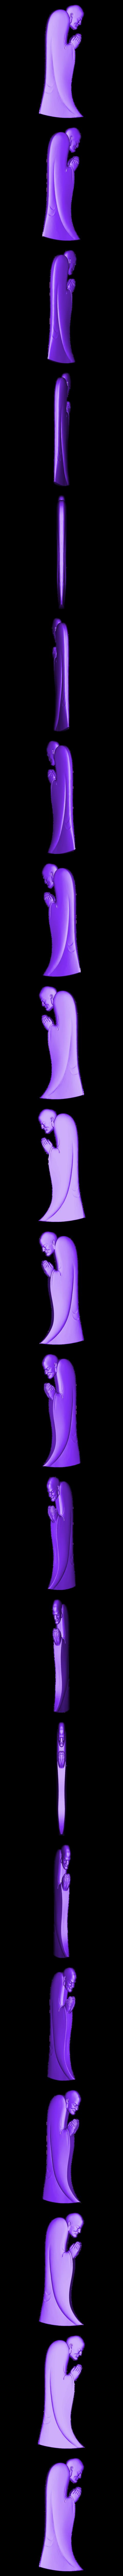 zen.stl Download free STL file zen • 3D printable template, stlfilesfree